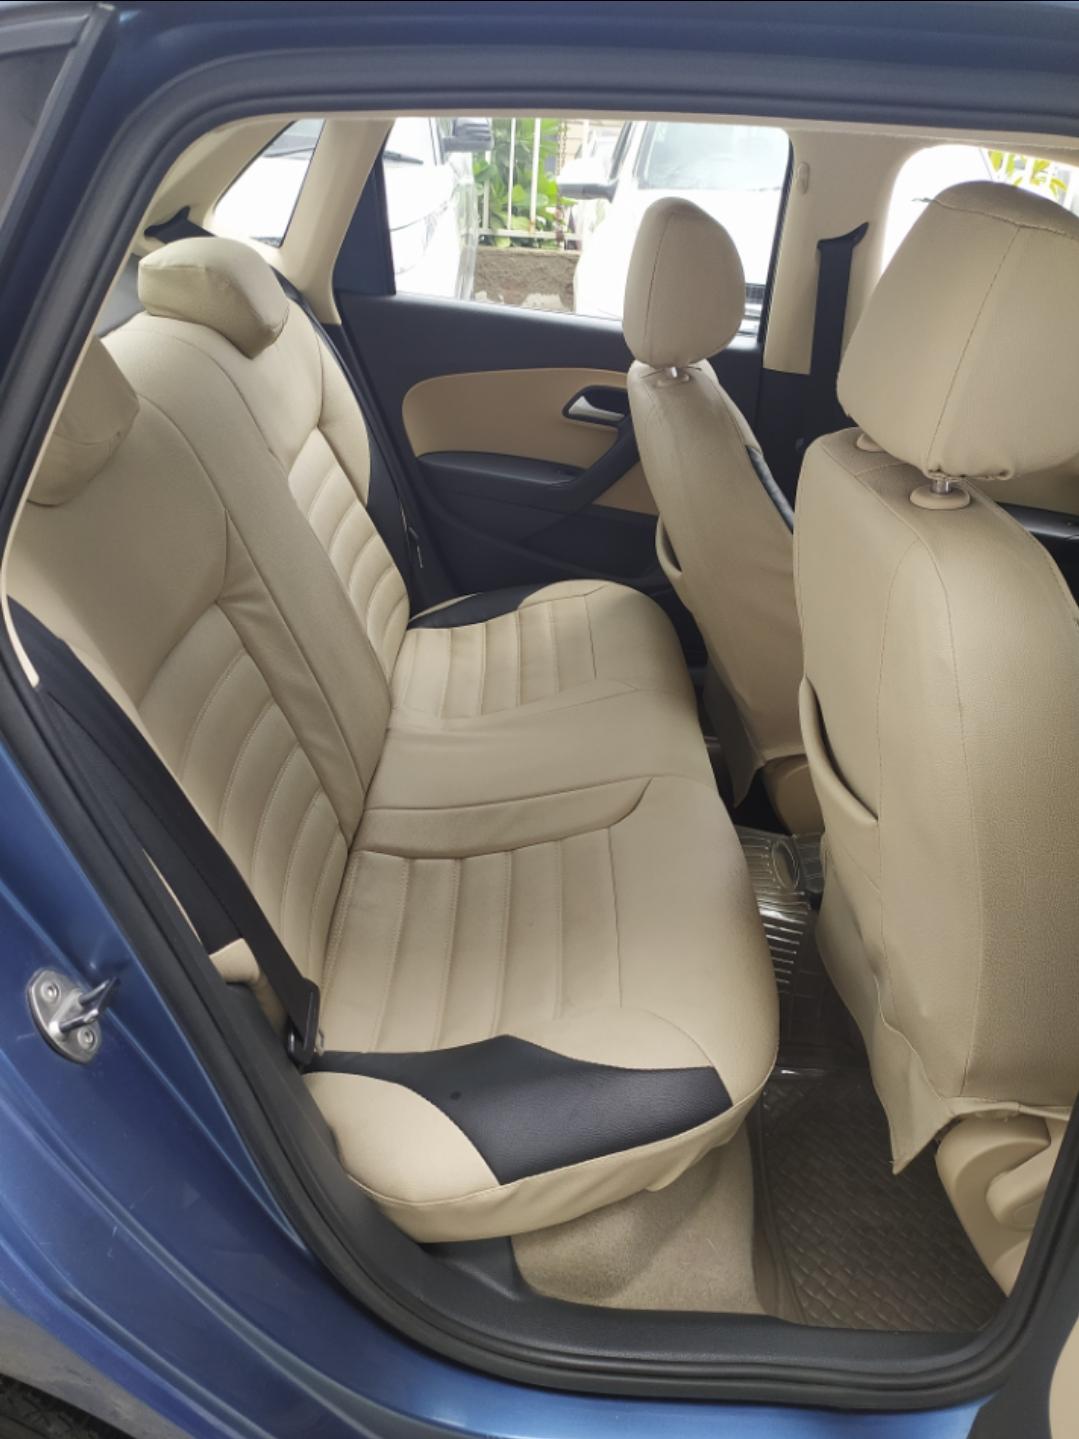 Back_seats 20200905172845